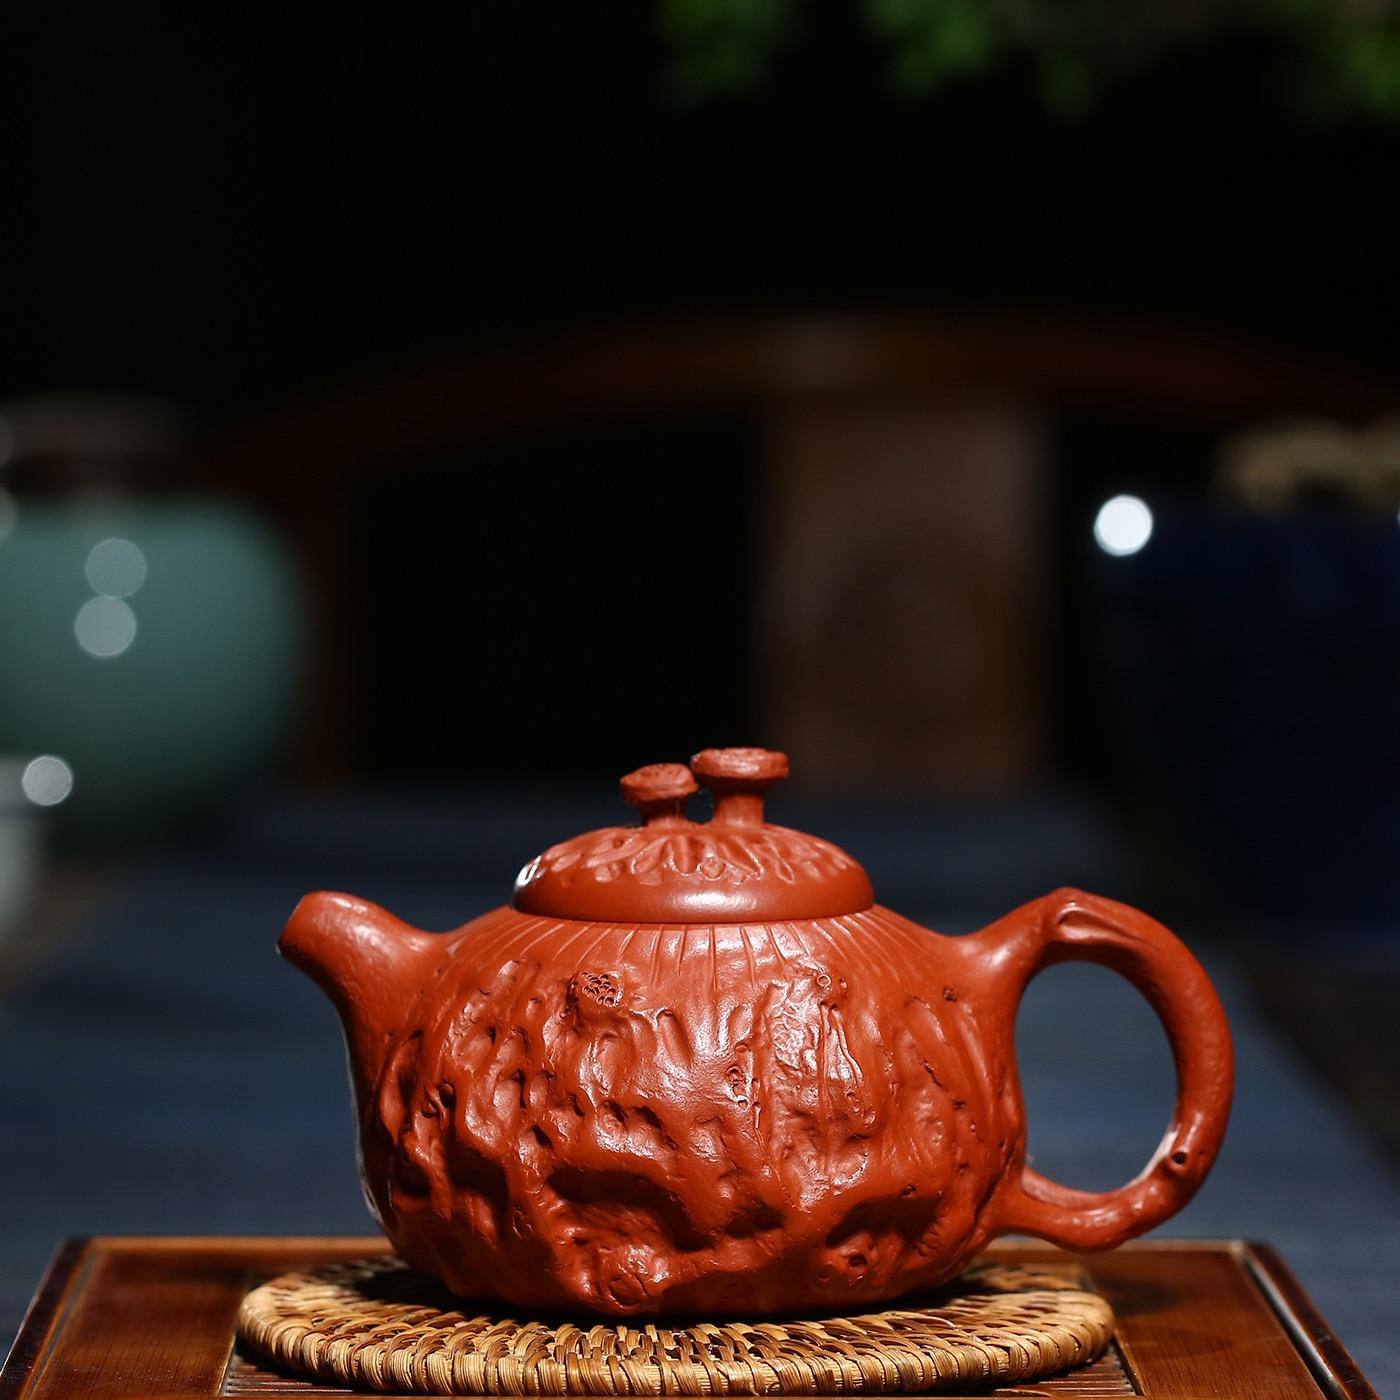 Enameled Pottery Teapot Famous Manual Make Raw Ore Cinnabar For Spring Pot Kungfu Online Teapot Tea Set Gift 280 MilliliterEnameled Pottery Teapot Famous Manual Make Raw Ore Cinnabar For Spring Pot Kungfu Online Teapot Tea Set Gift 280 Milliliter